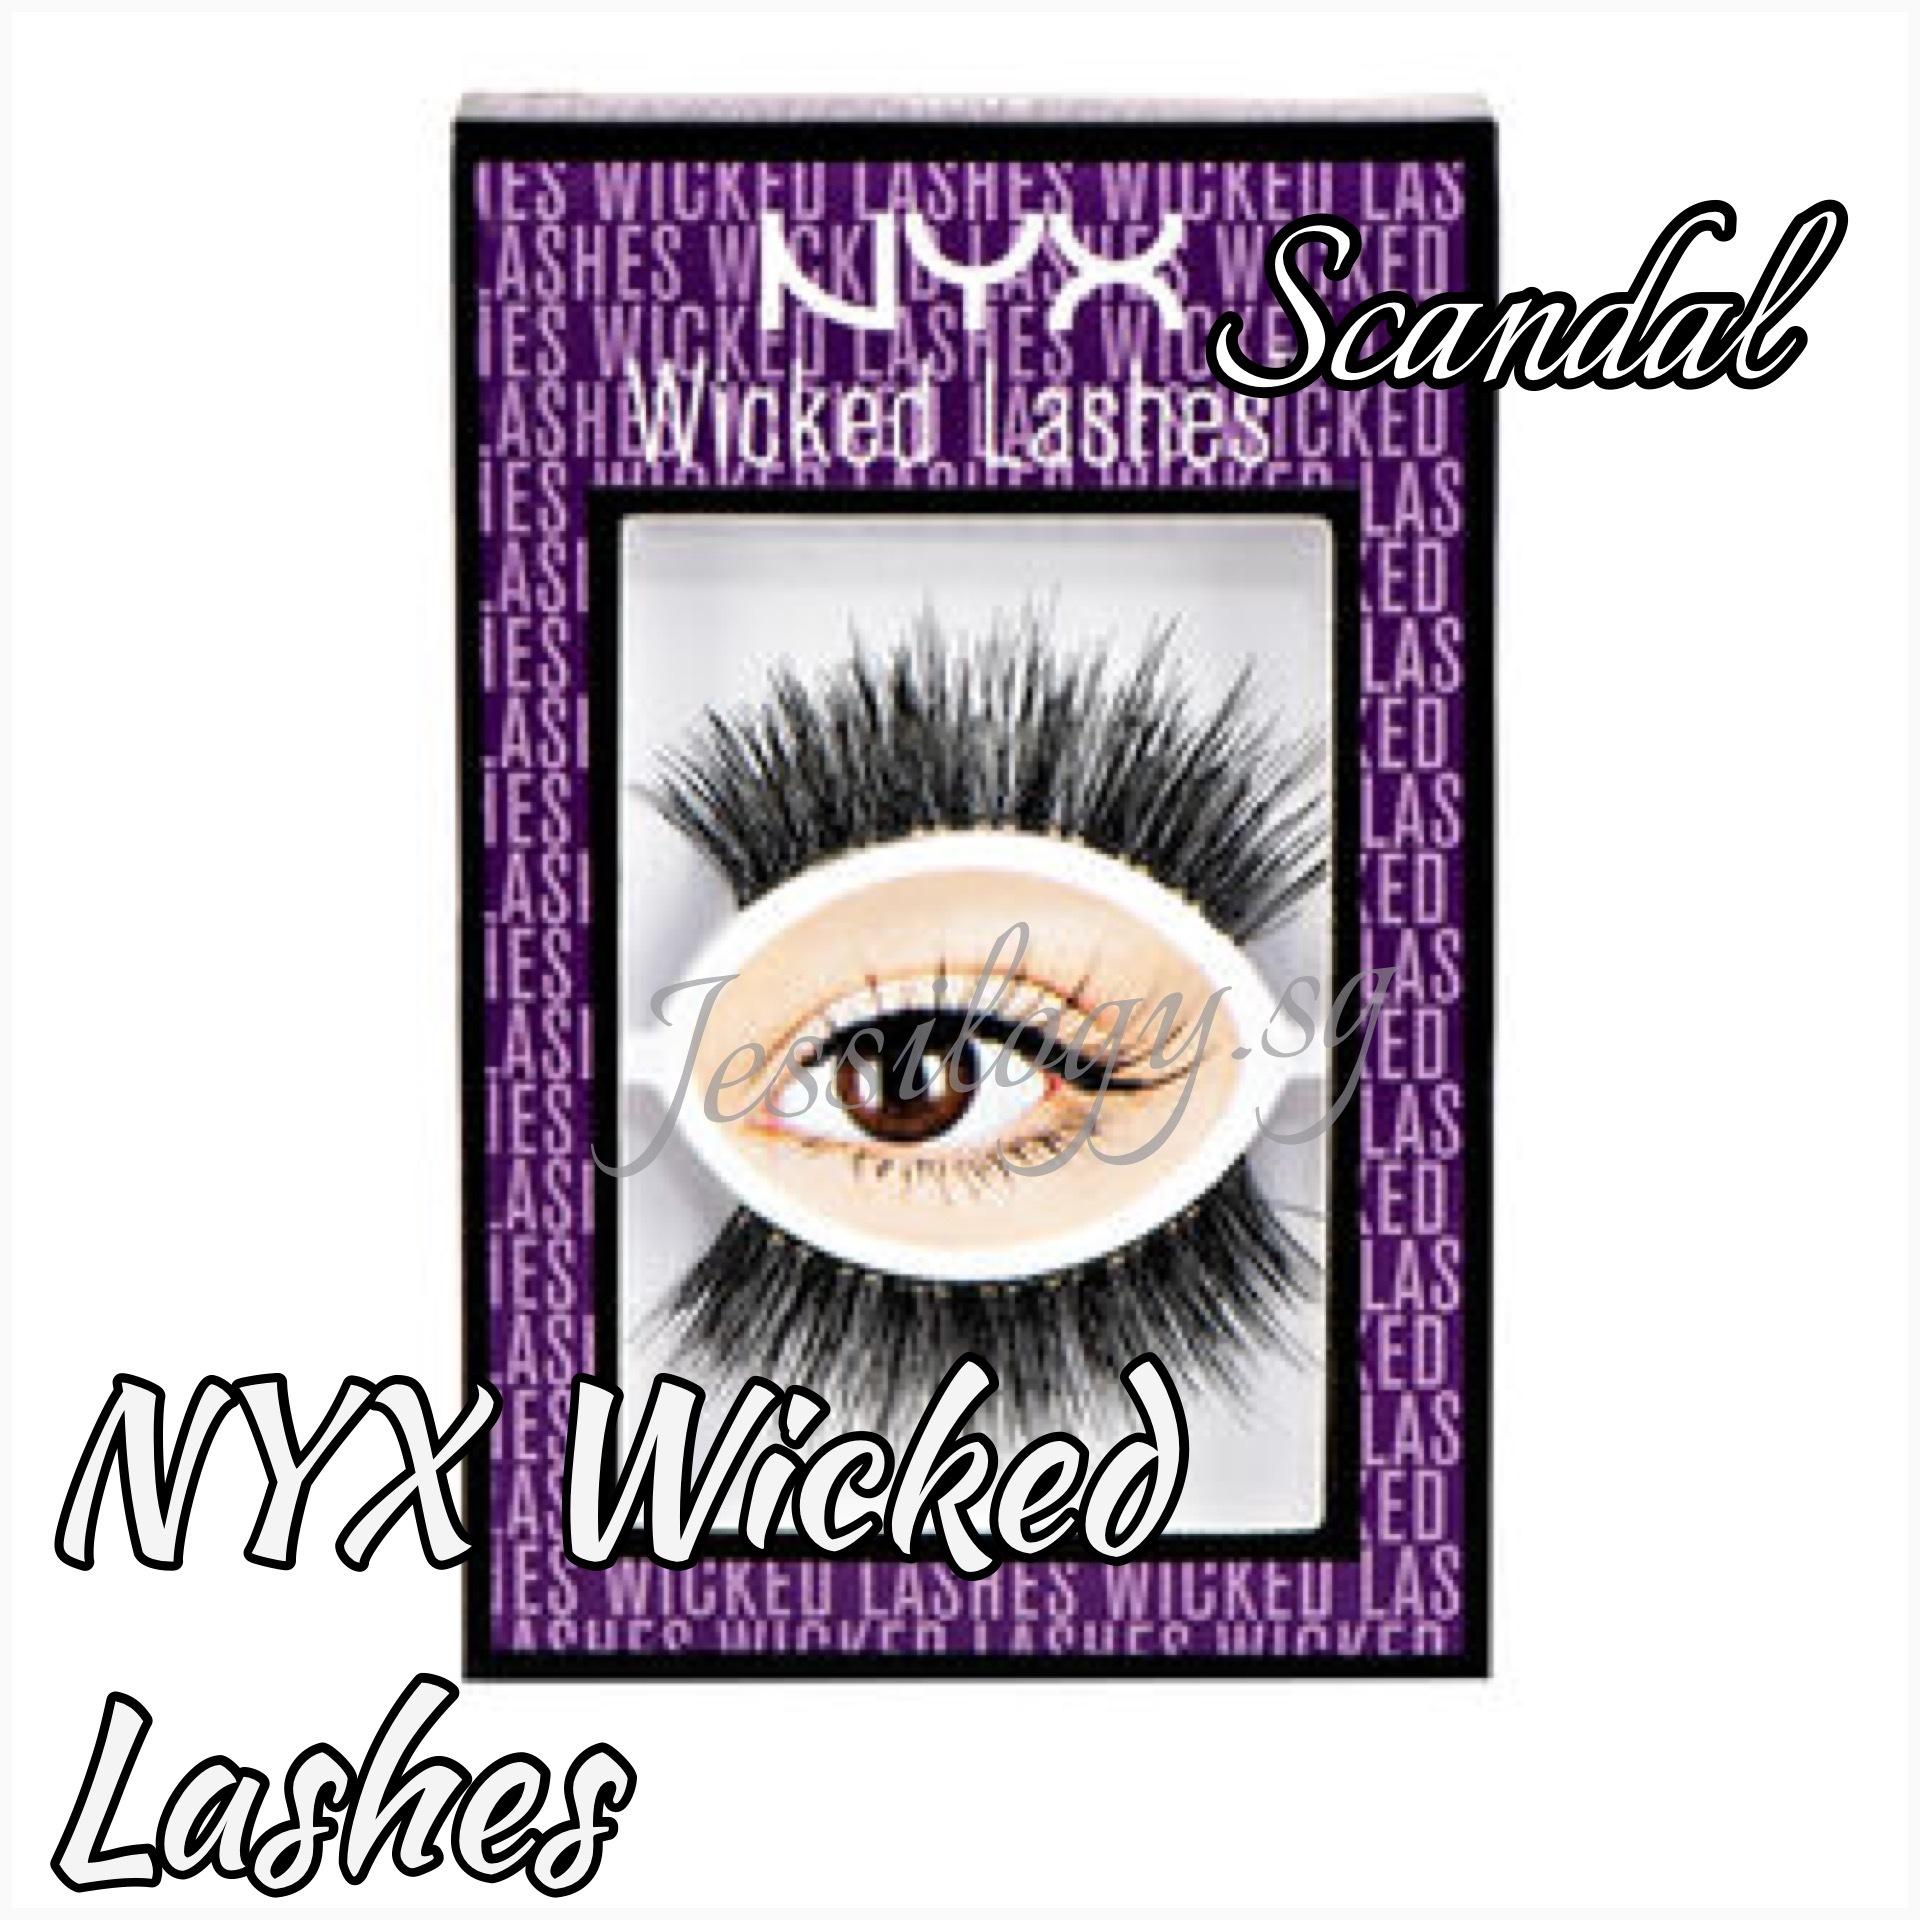 f4b1b94db23 Qoo10 - NYX Wicked Lashes : Cosmetics